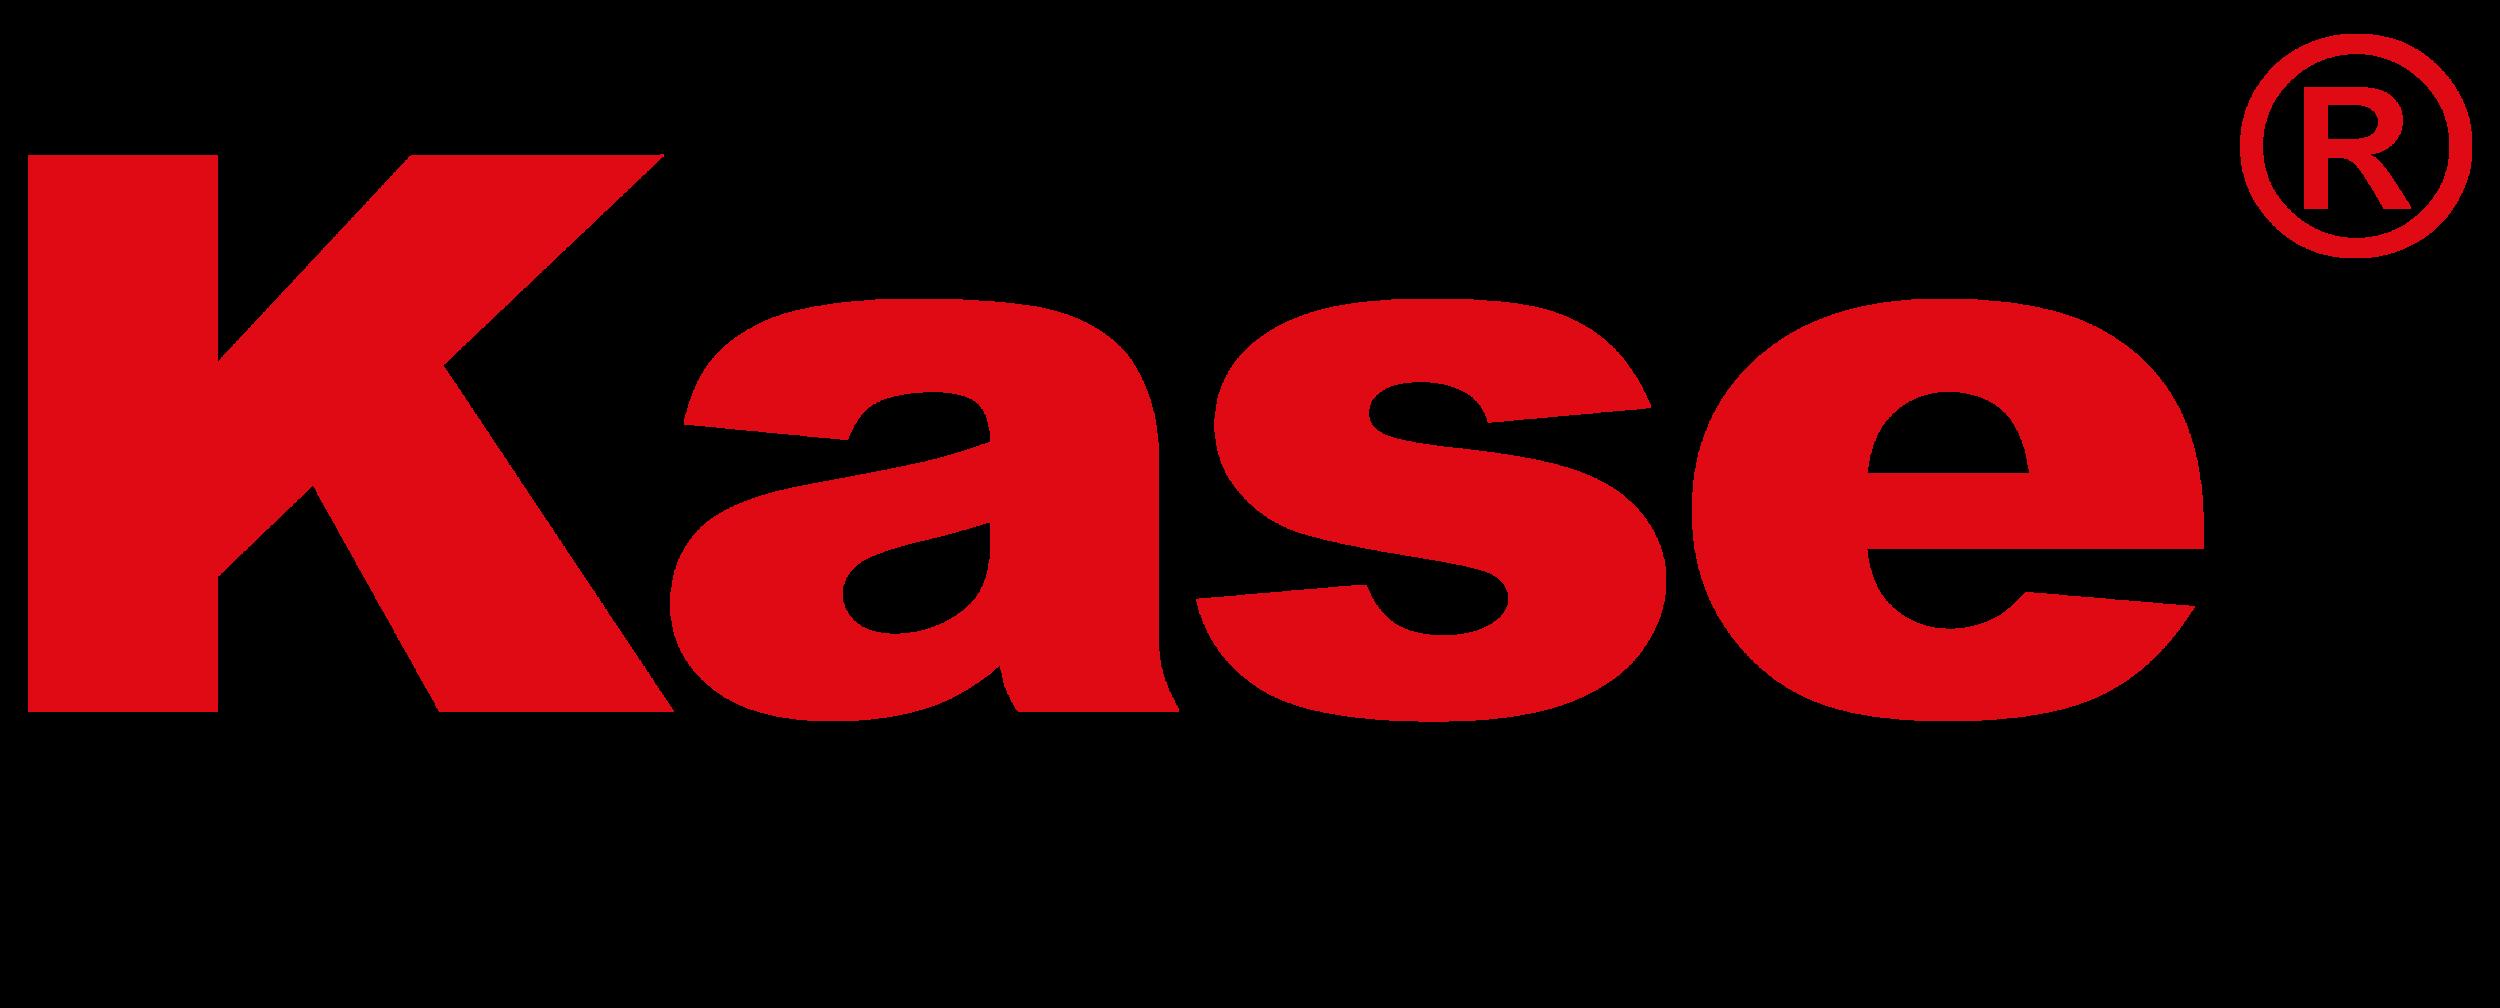 kase-hashtag-small.png